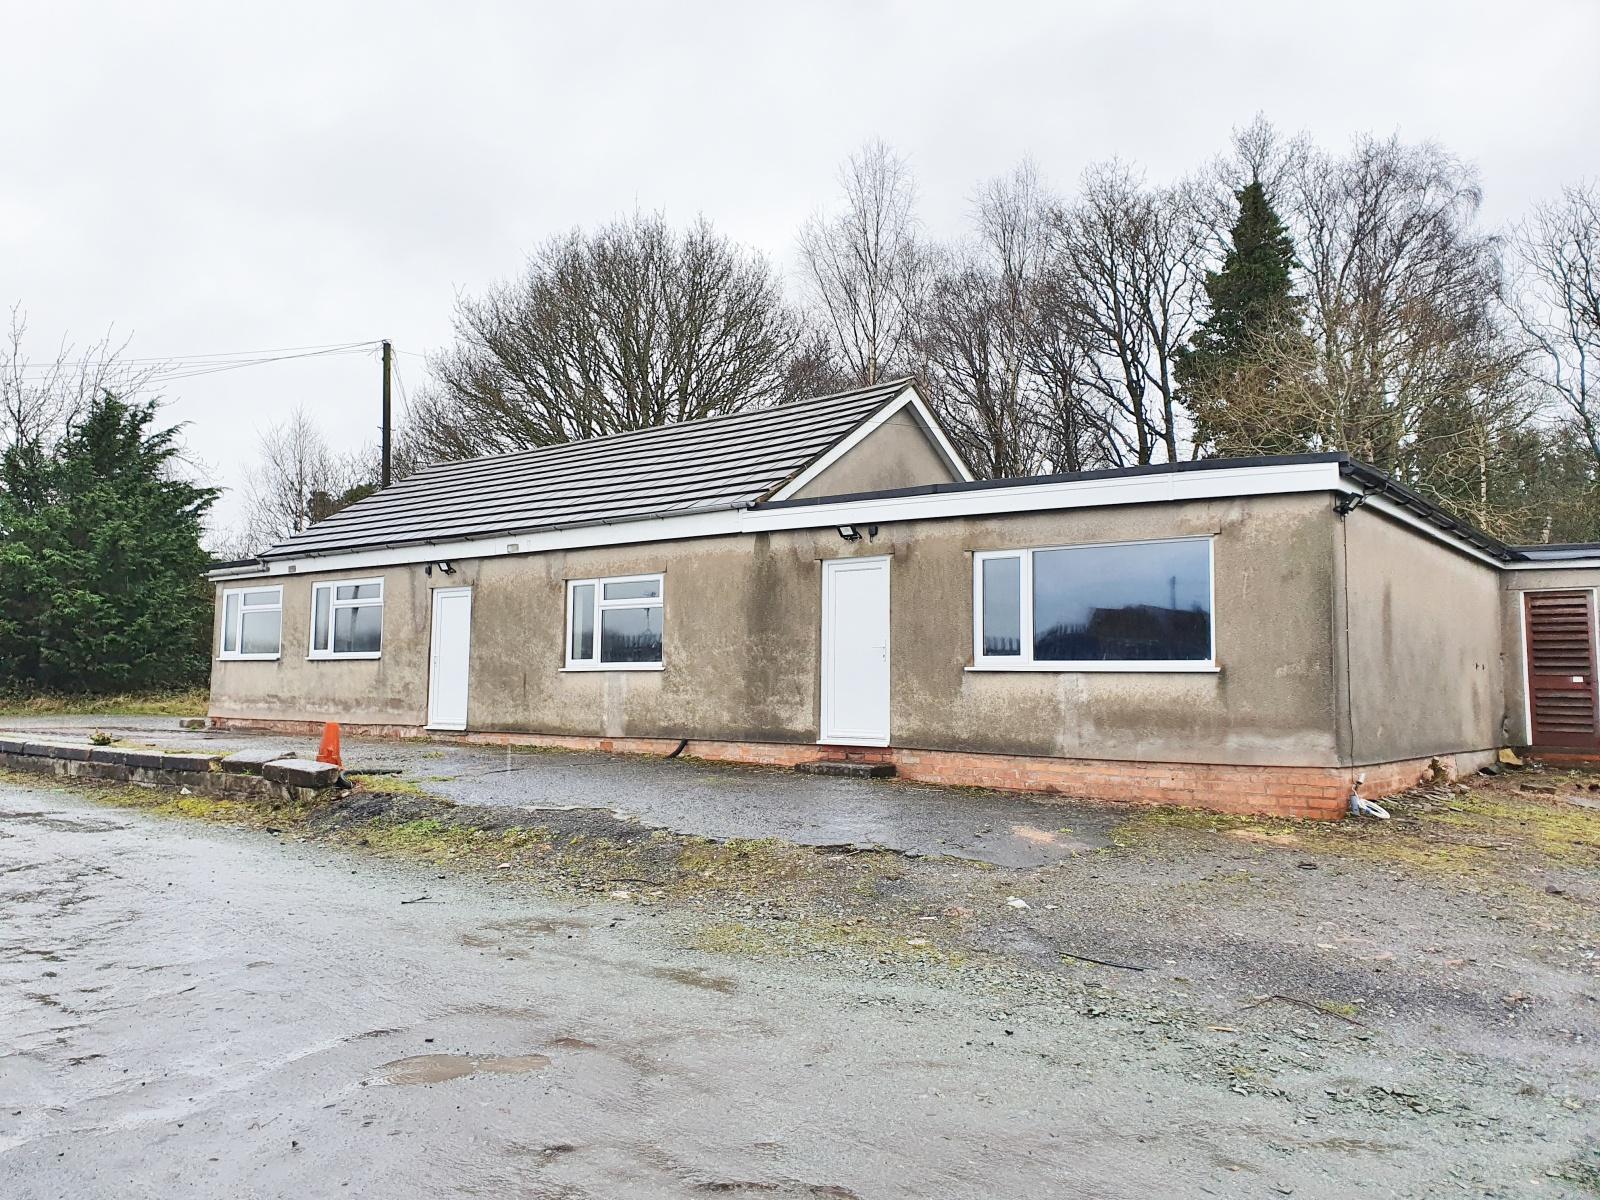 Former Weighbridge Office, Upper Battlefield, Shrewsbury, Shropshire